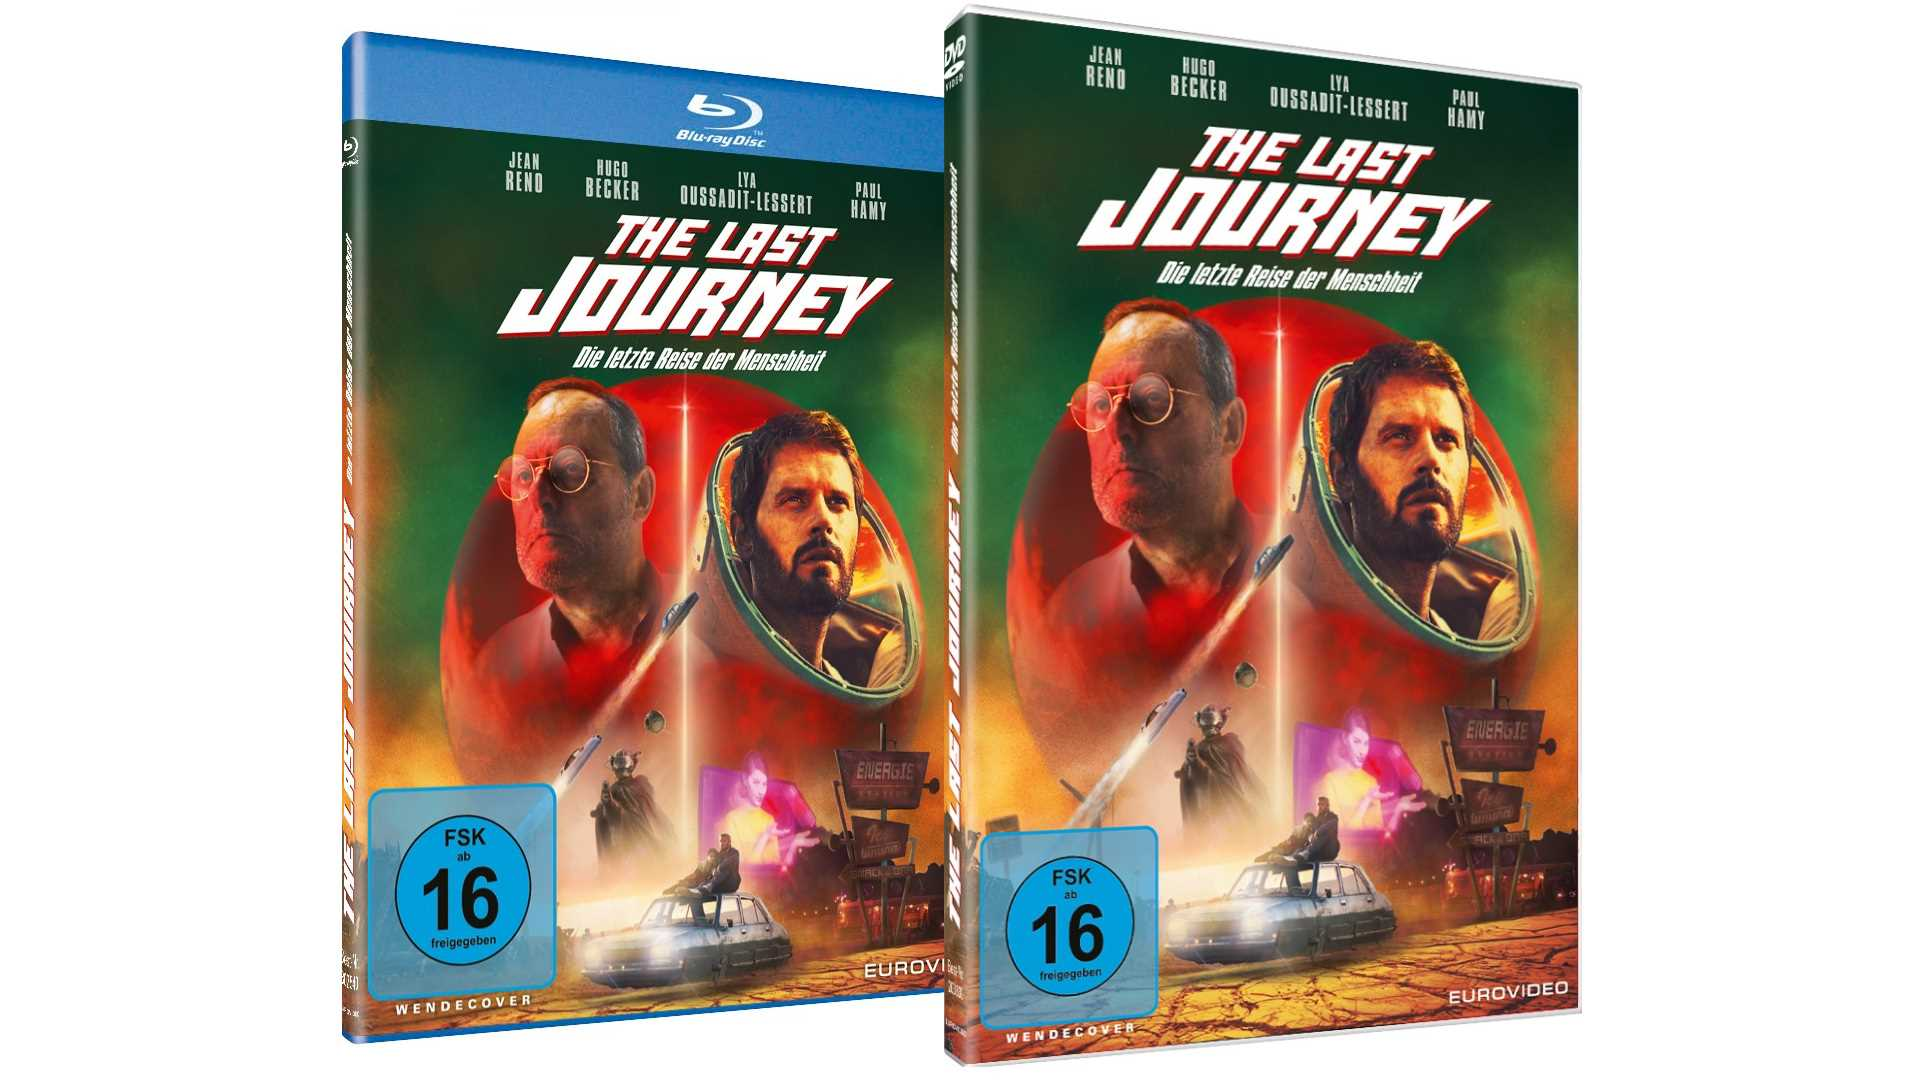 The Last Journey - DVD u. Blu-ray